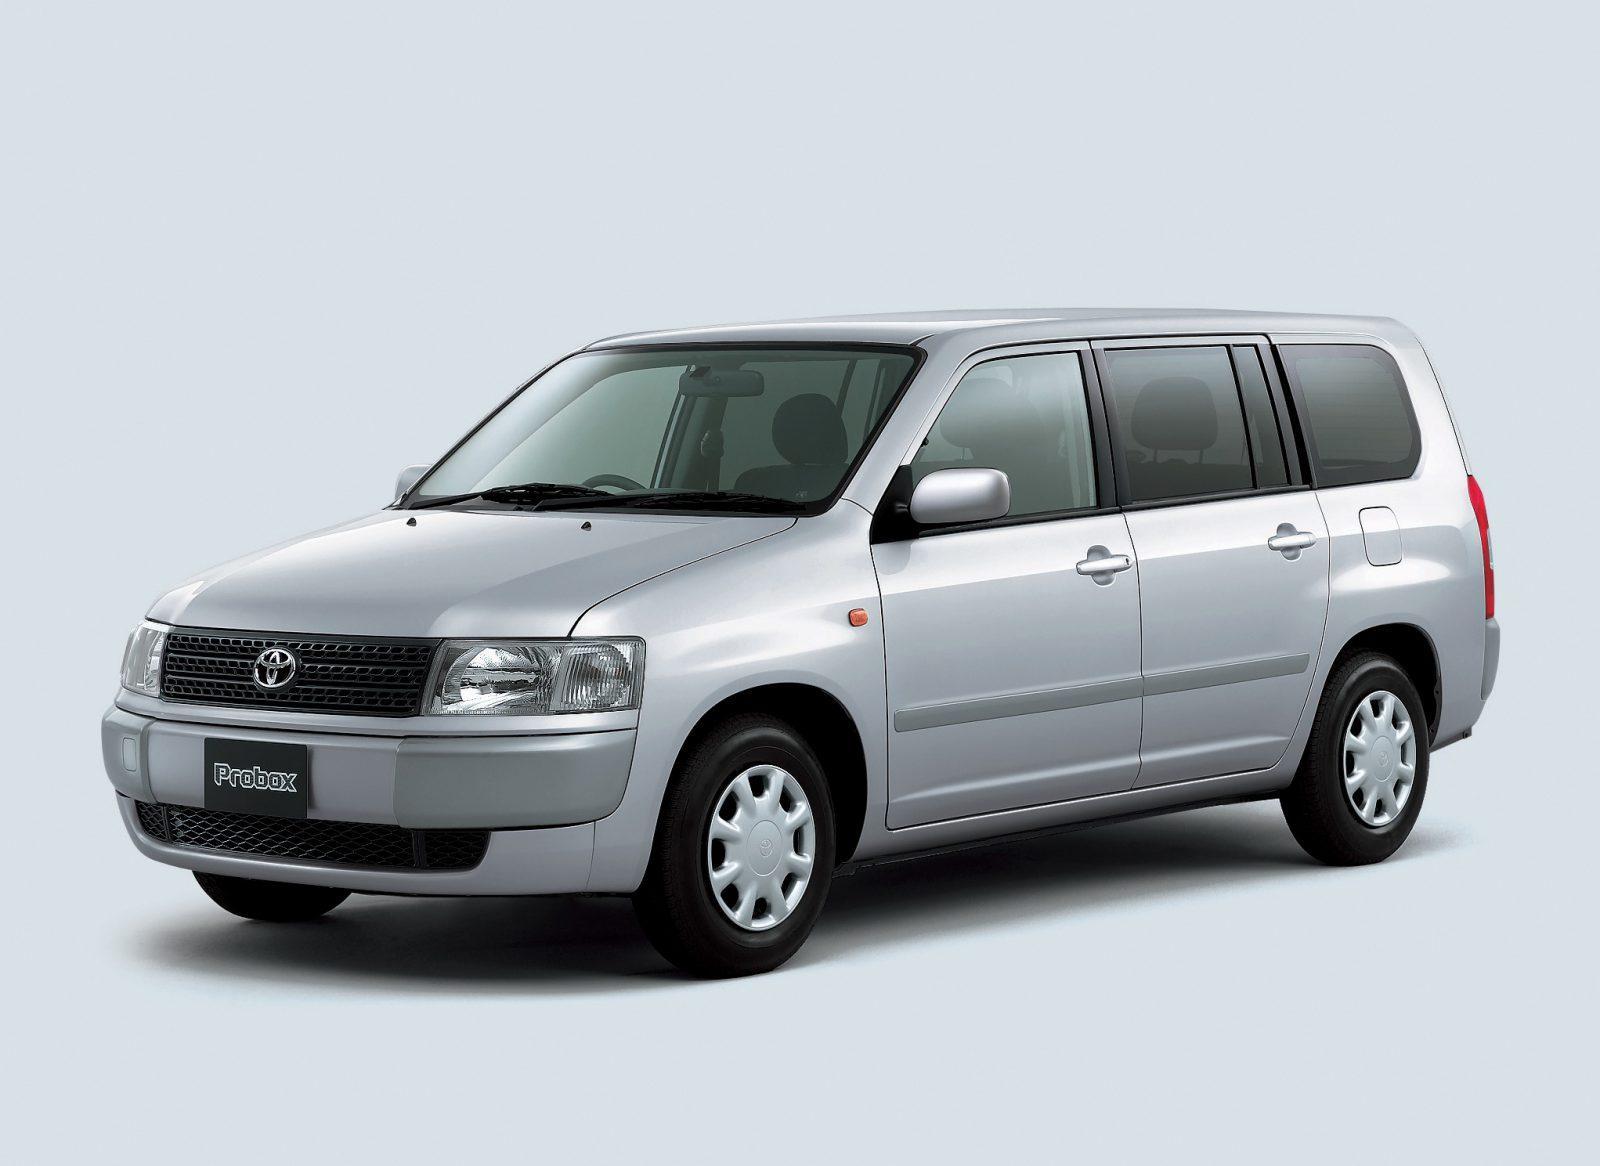 comparison between probox van vs nissan vanette car from japan. Black Bedroom Furniture Sets. Home Design Ideas